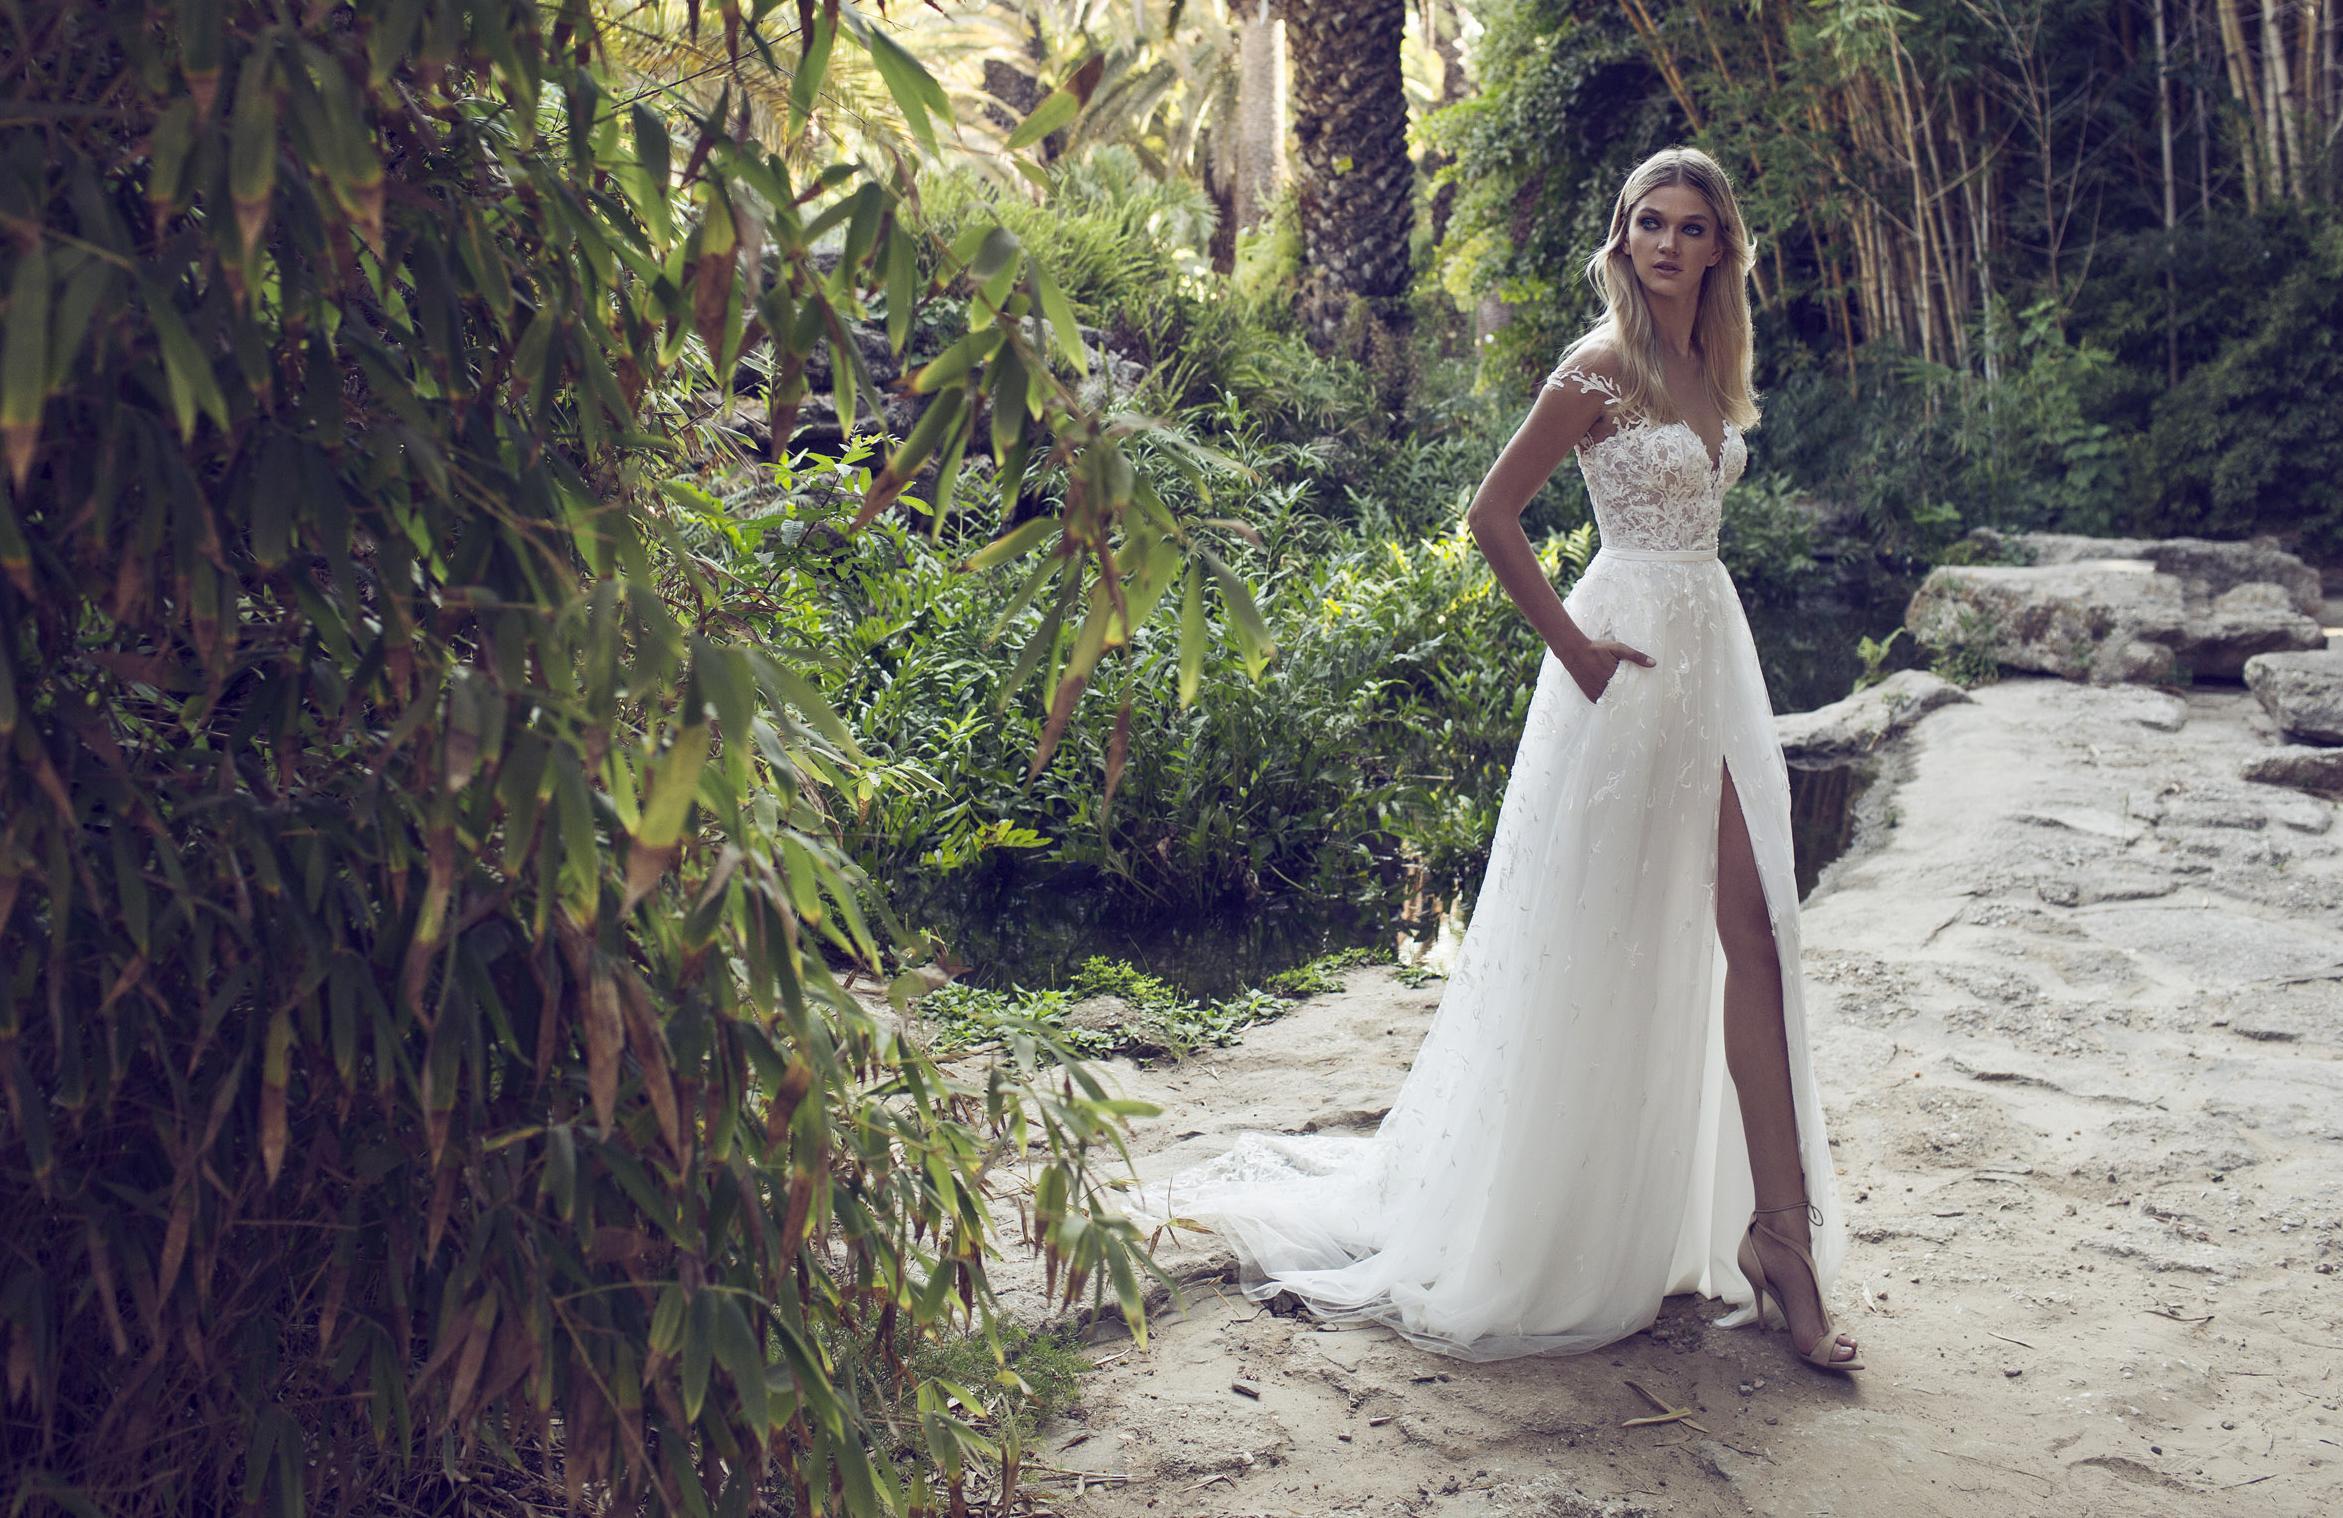 wedding dresses salt lake photo - 1